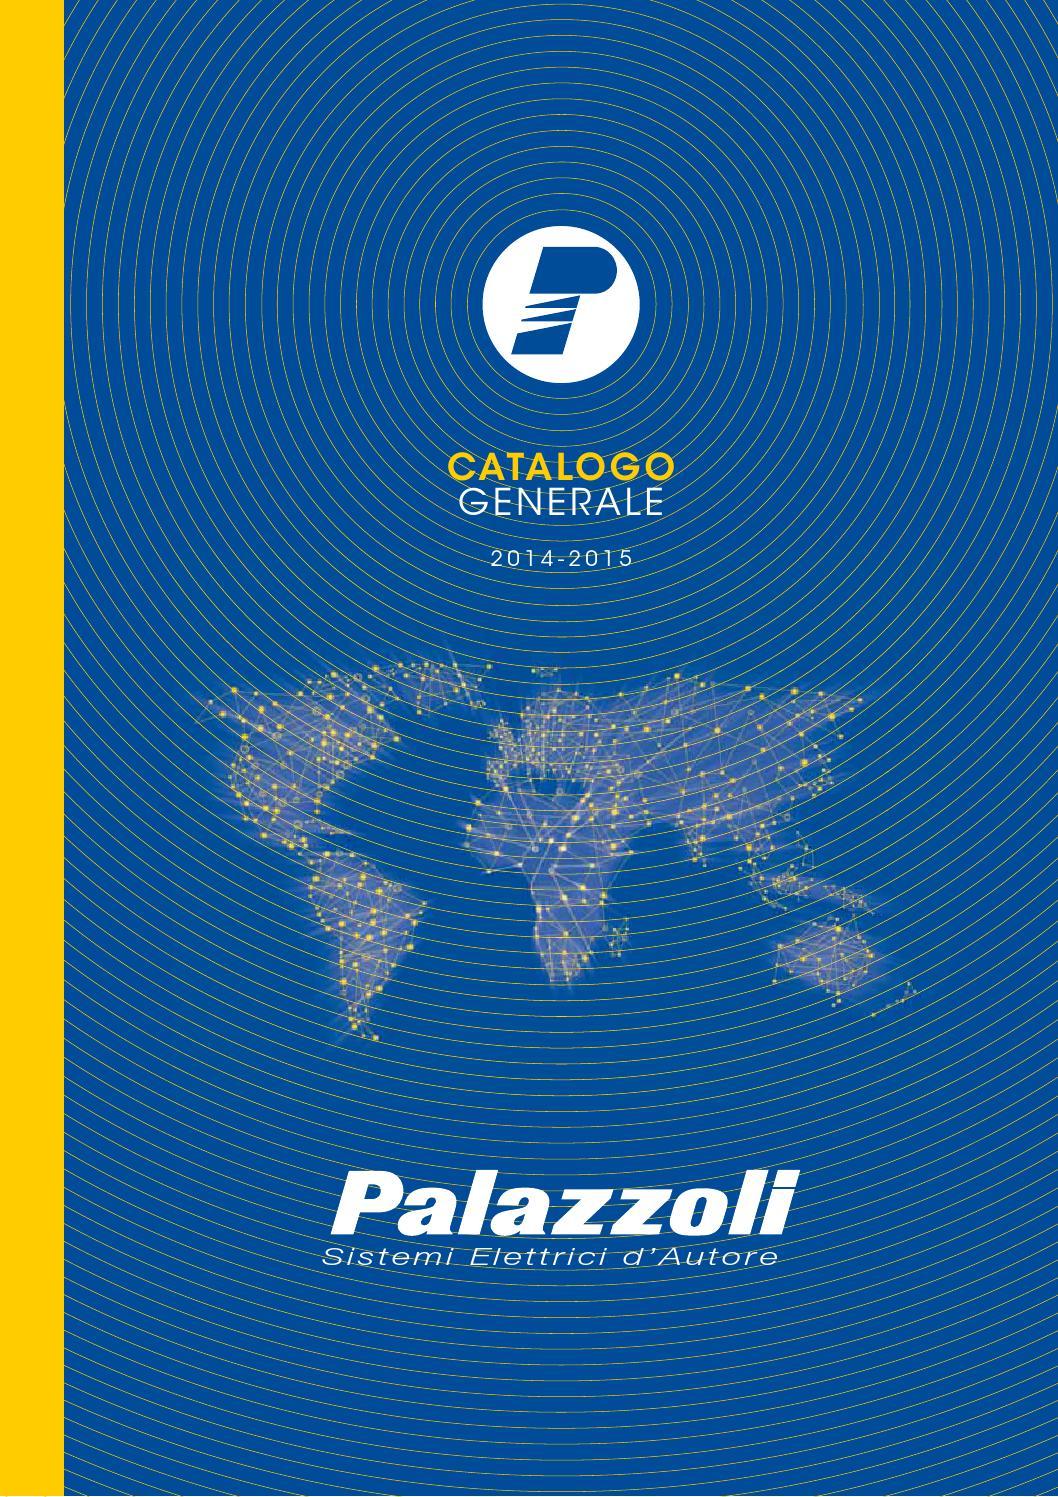 PALAZZOLI CASSETTA TAIS TERMOINDURENTE 62X80X38 2 INGRESSI IP65 101021